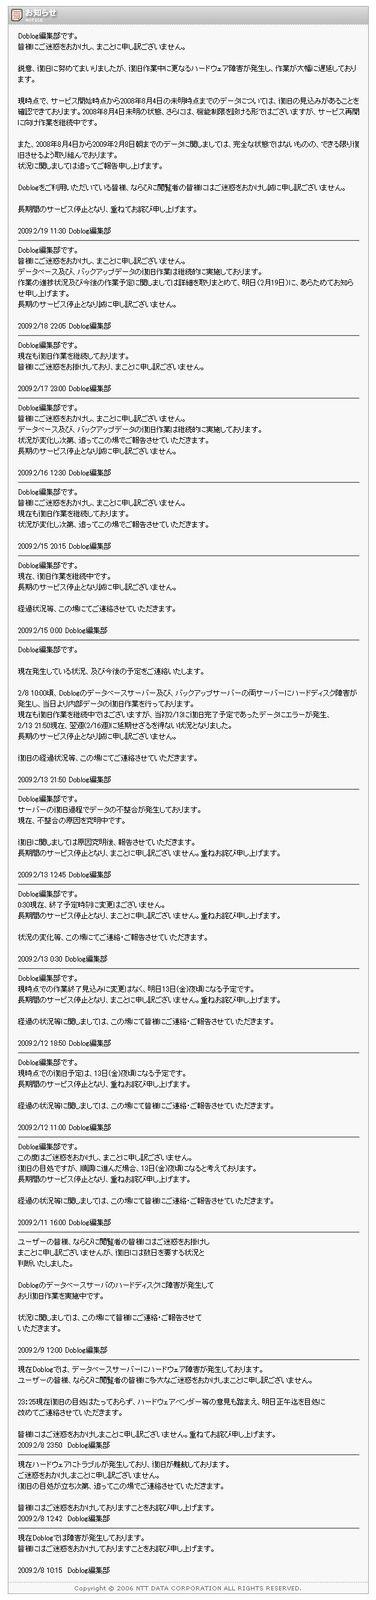 Doblog_20090220